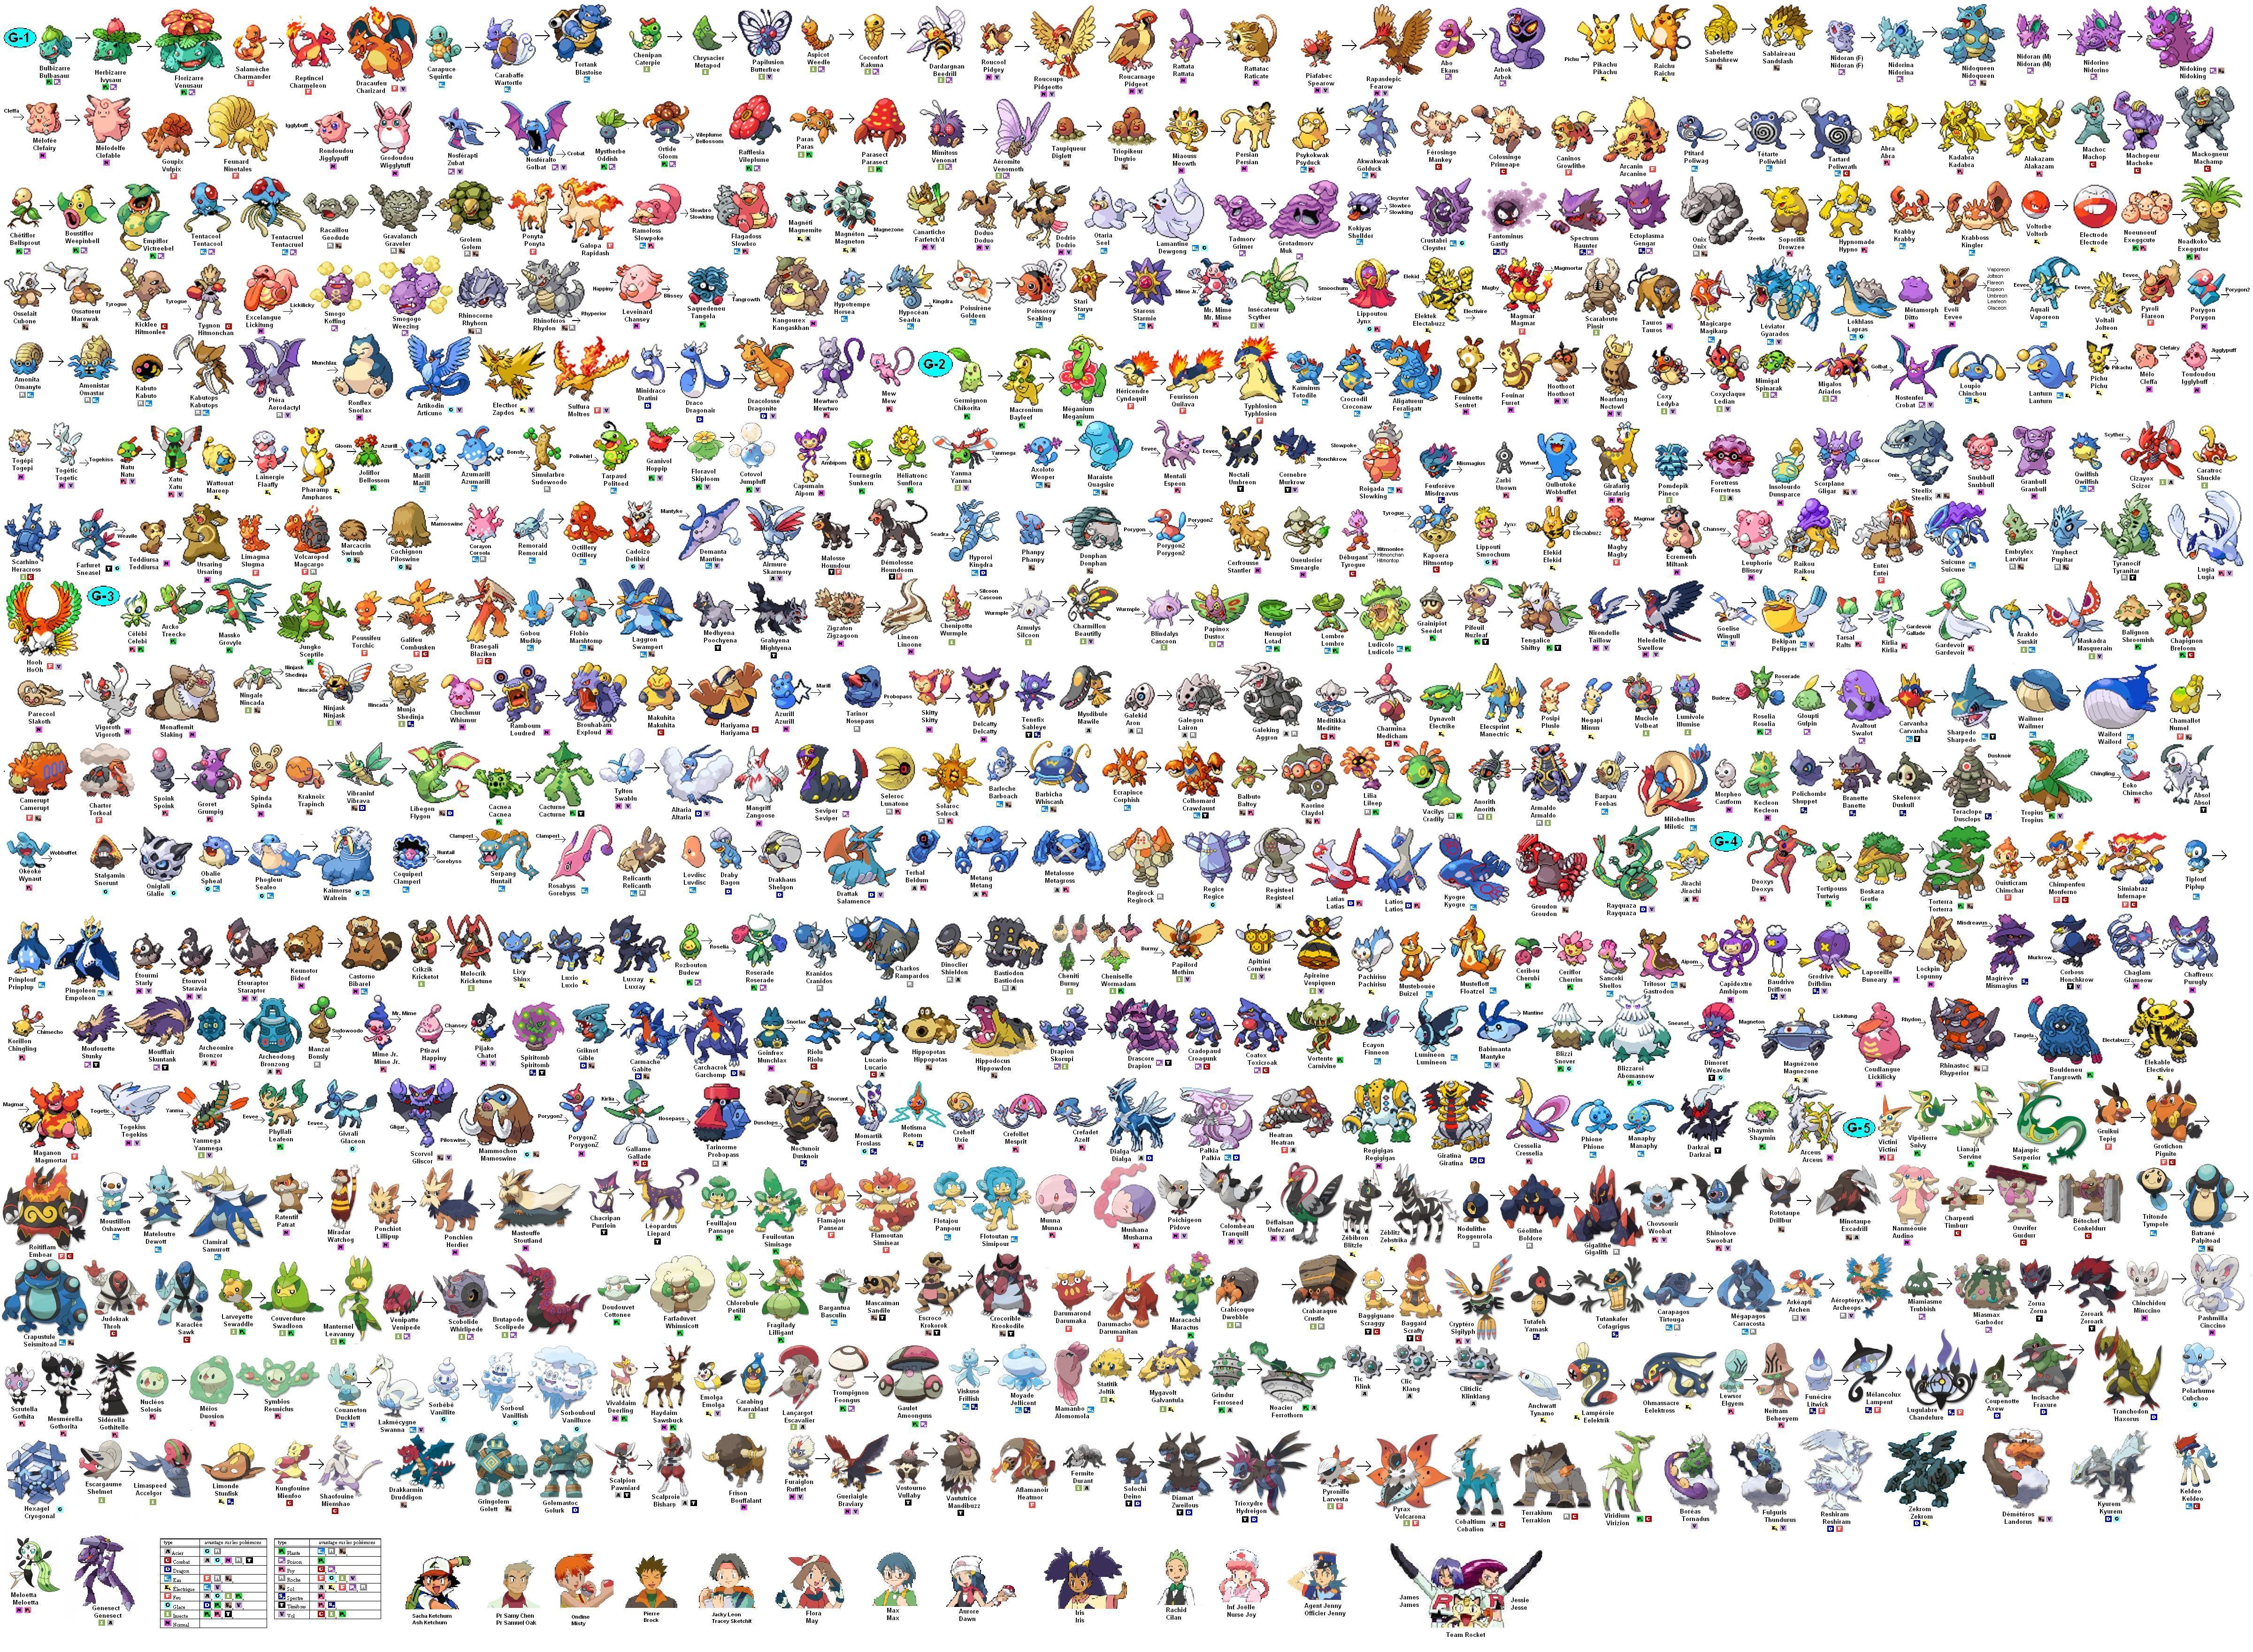 all 649 pokemon with their name in english leurs noms en francais